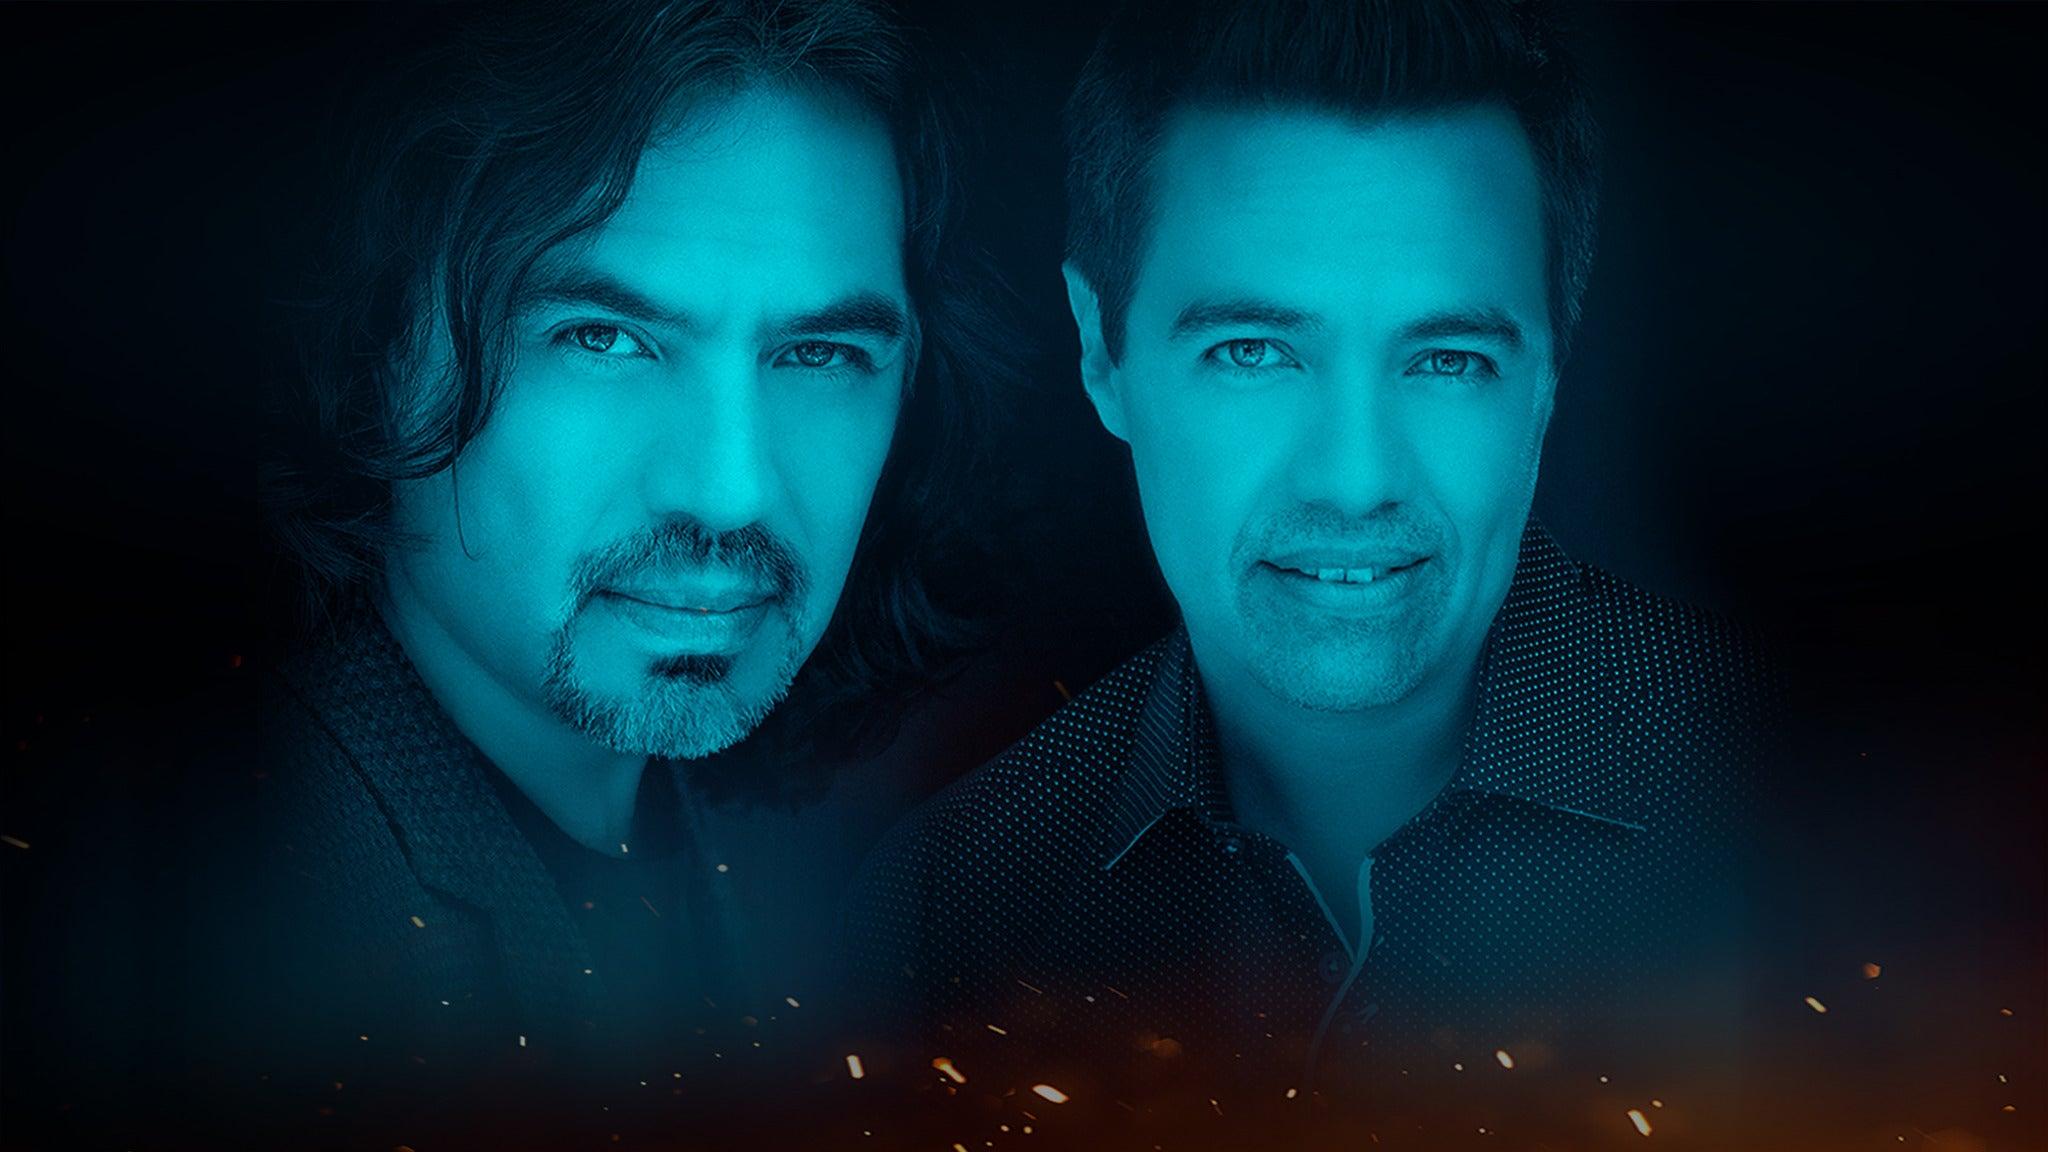 LOS TEMERARIOS | 2022 US TOUR at Atlanta Coliseum